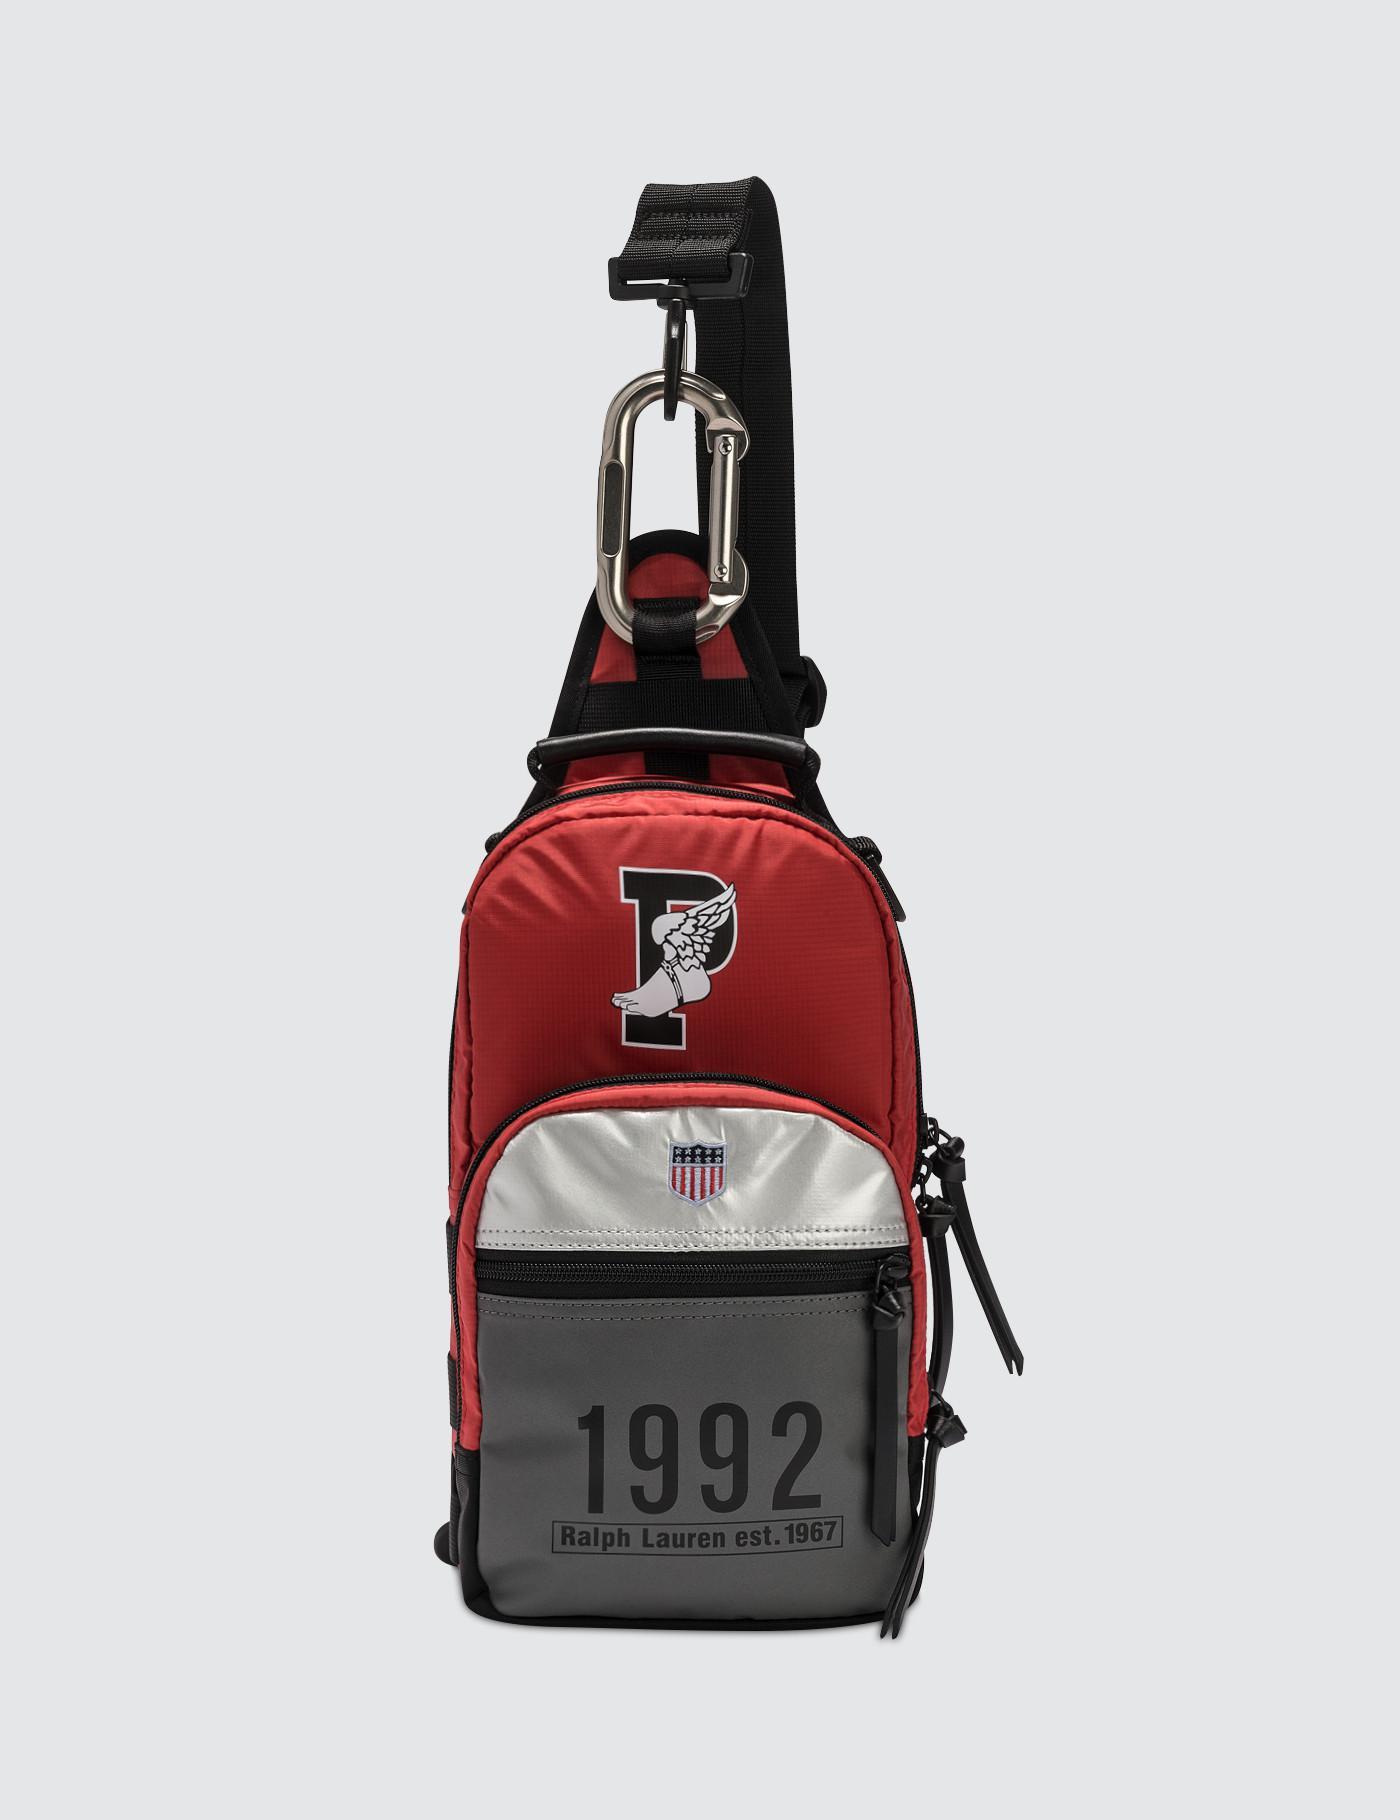 Lyst - Polo Ralph Lauren Medium Stadium Cross-body Nylon Bag in Red ... 4e5cccc895fdc